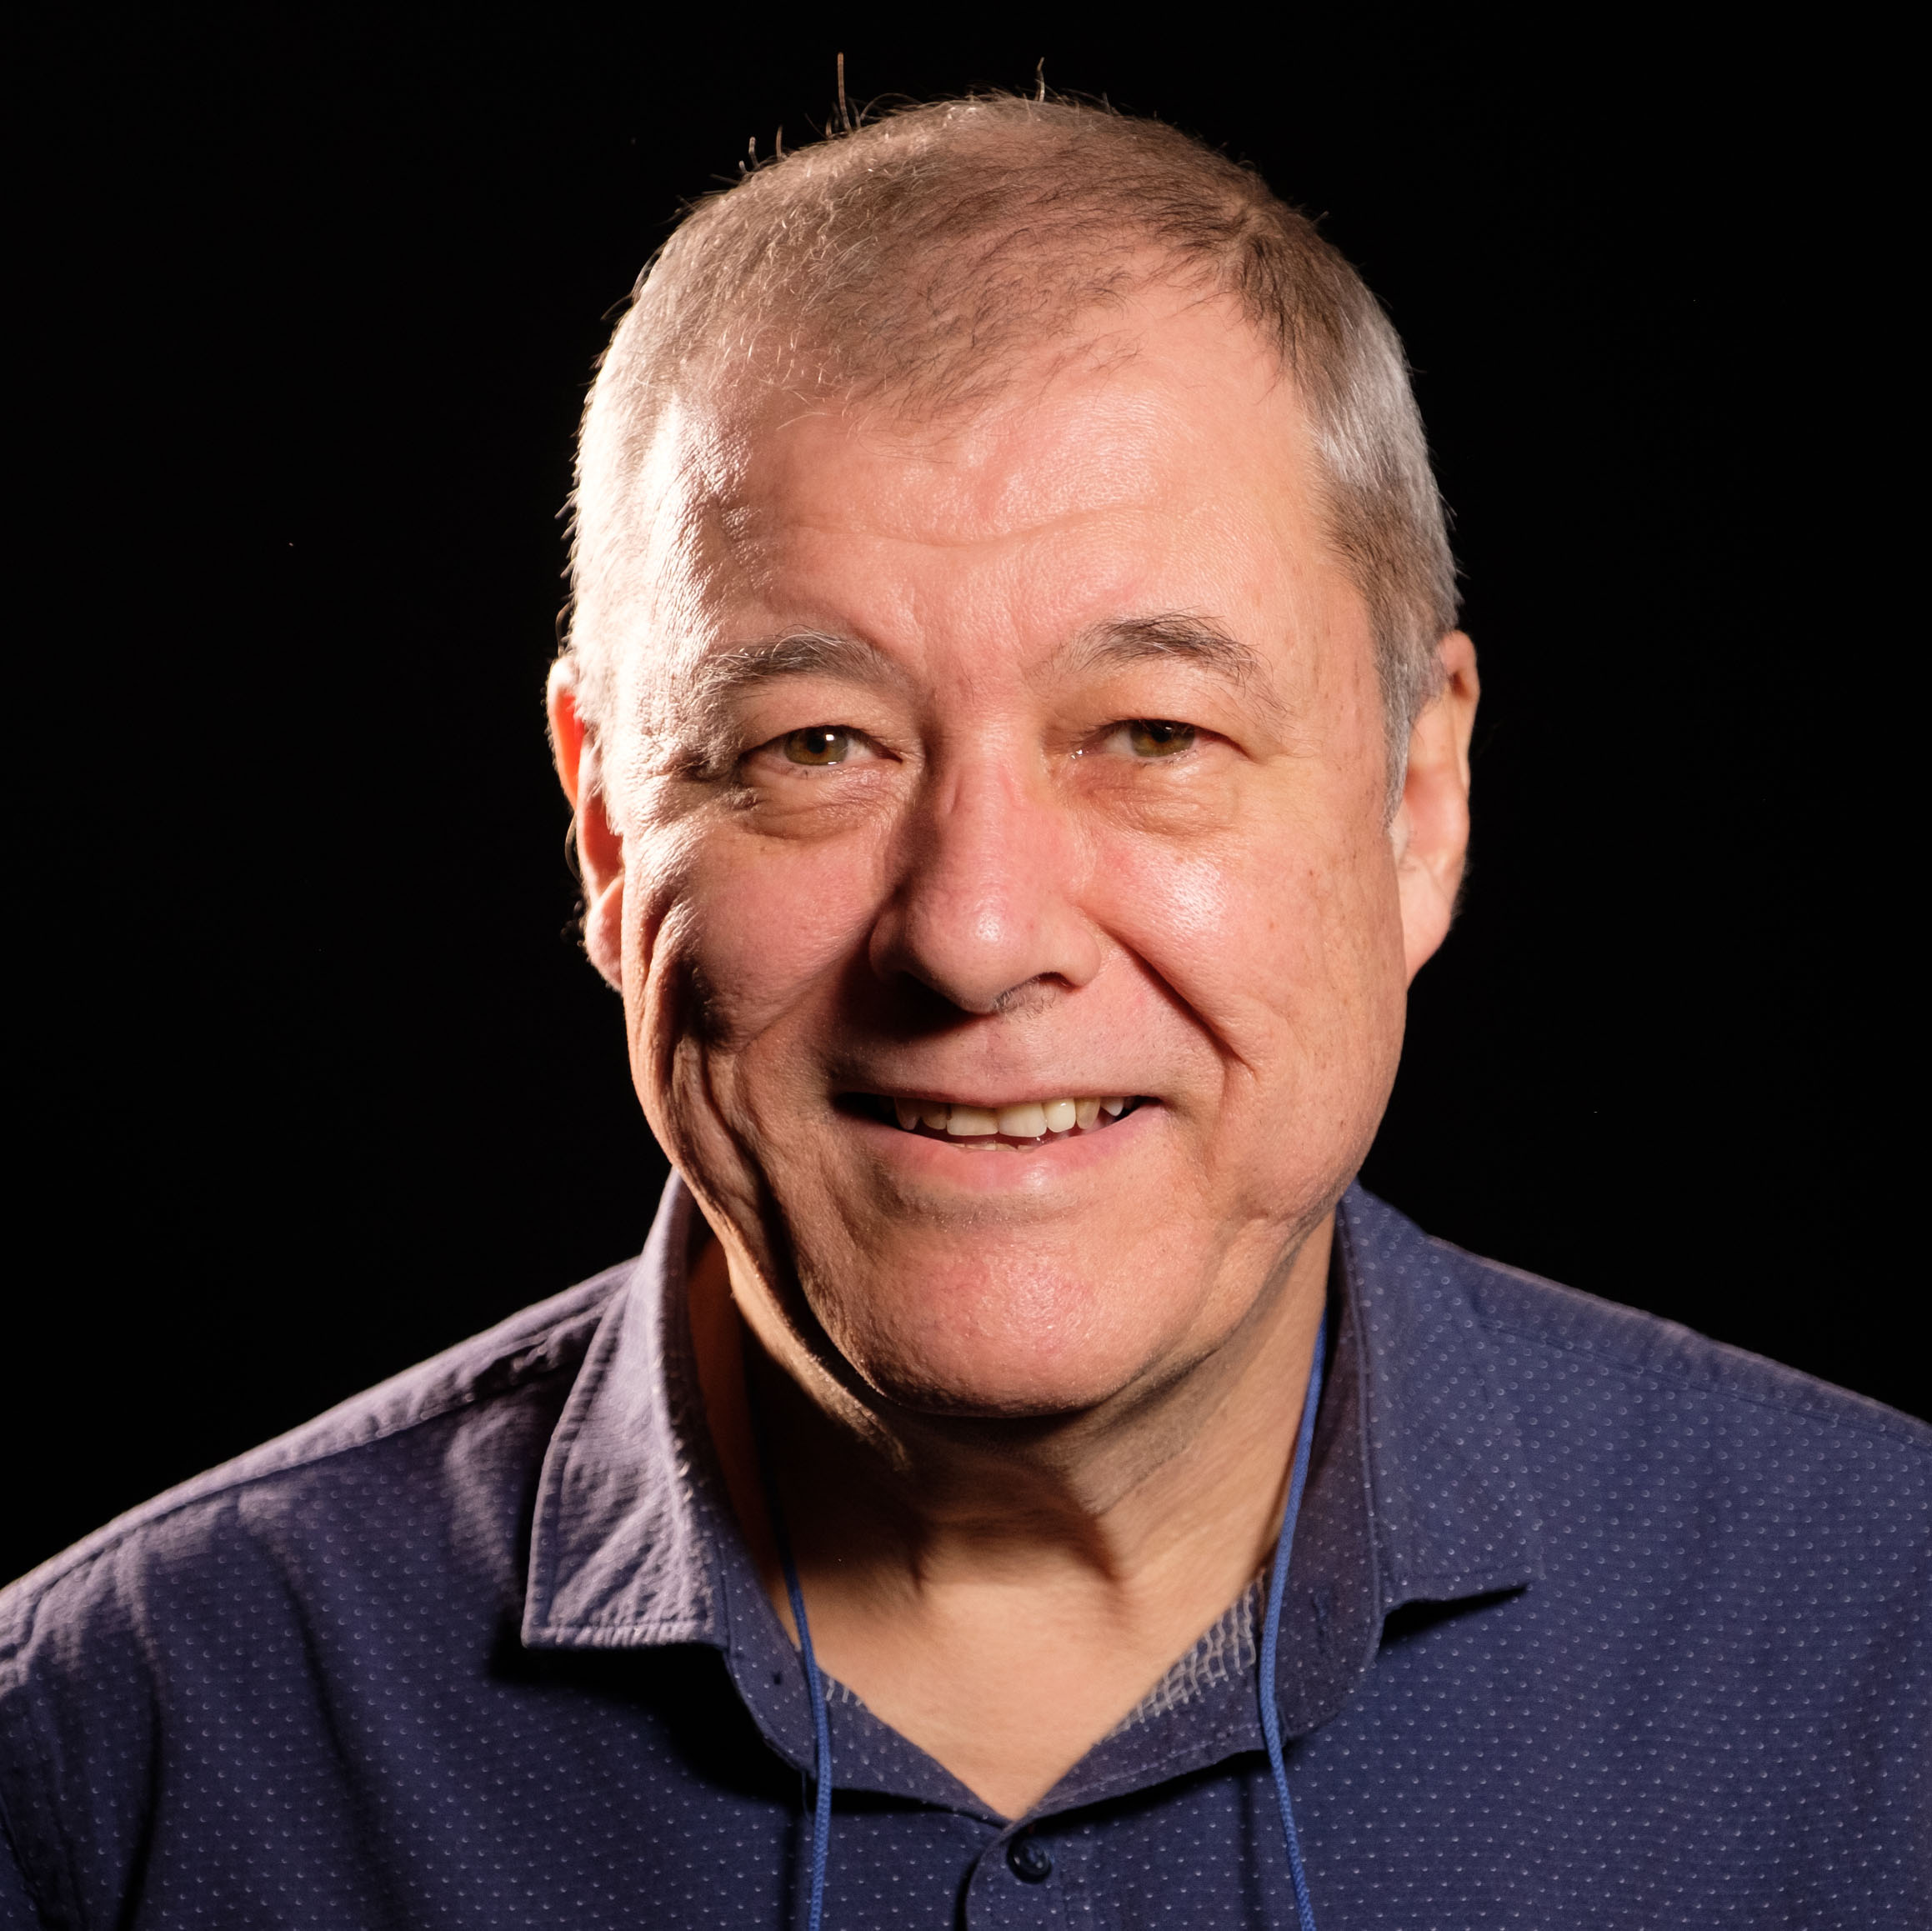 Martin Hochuli